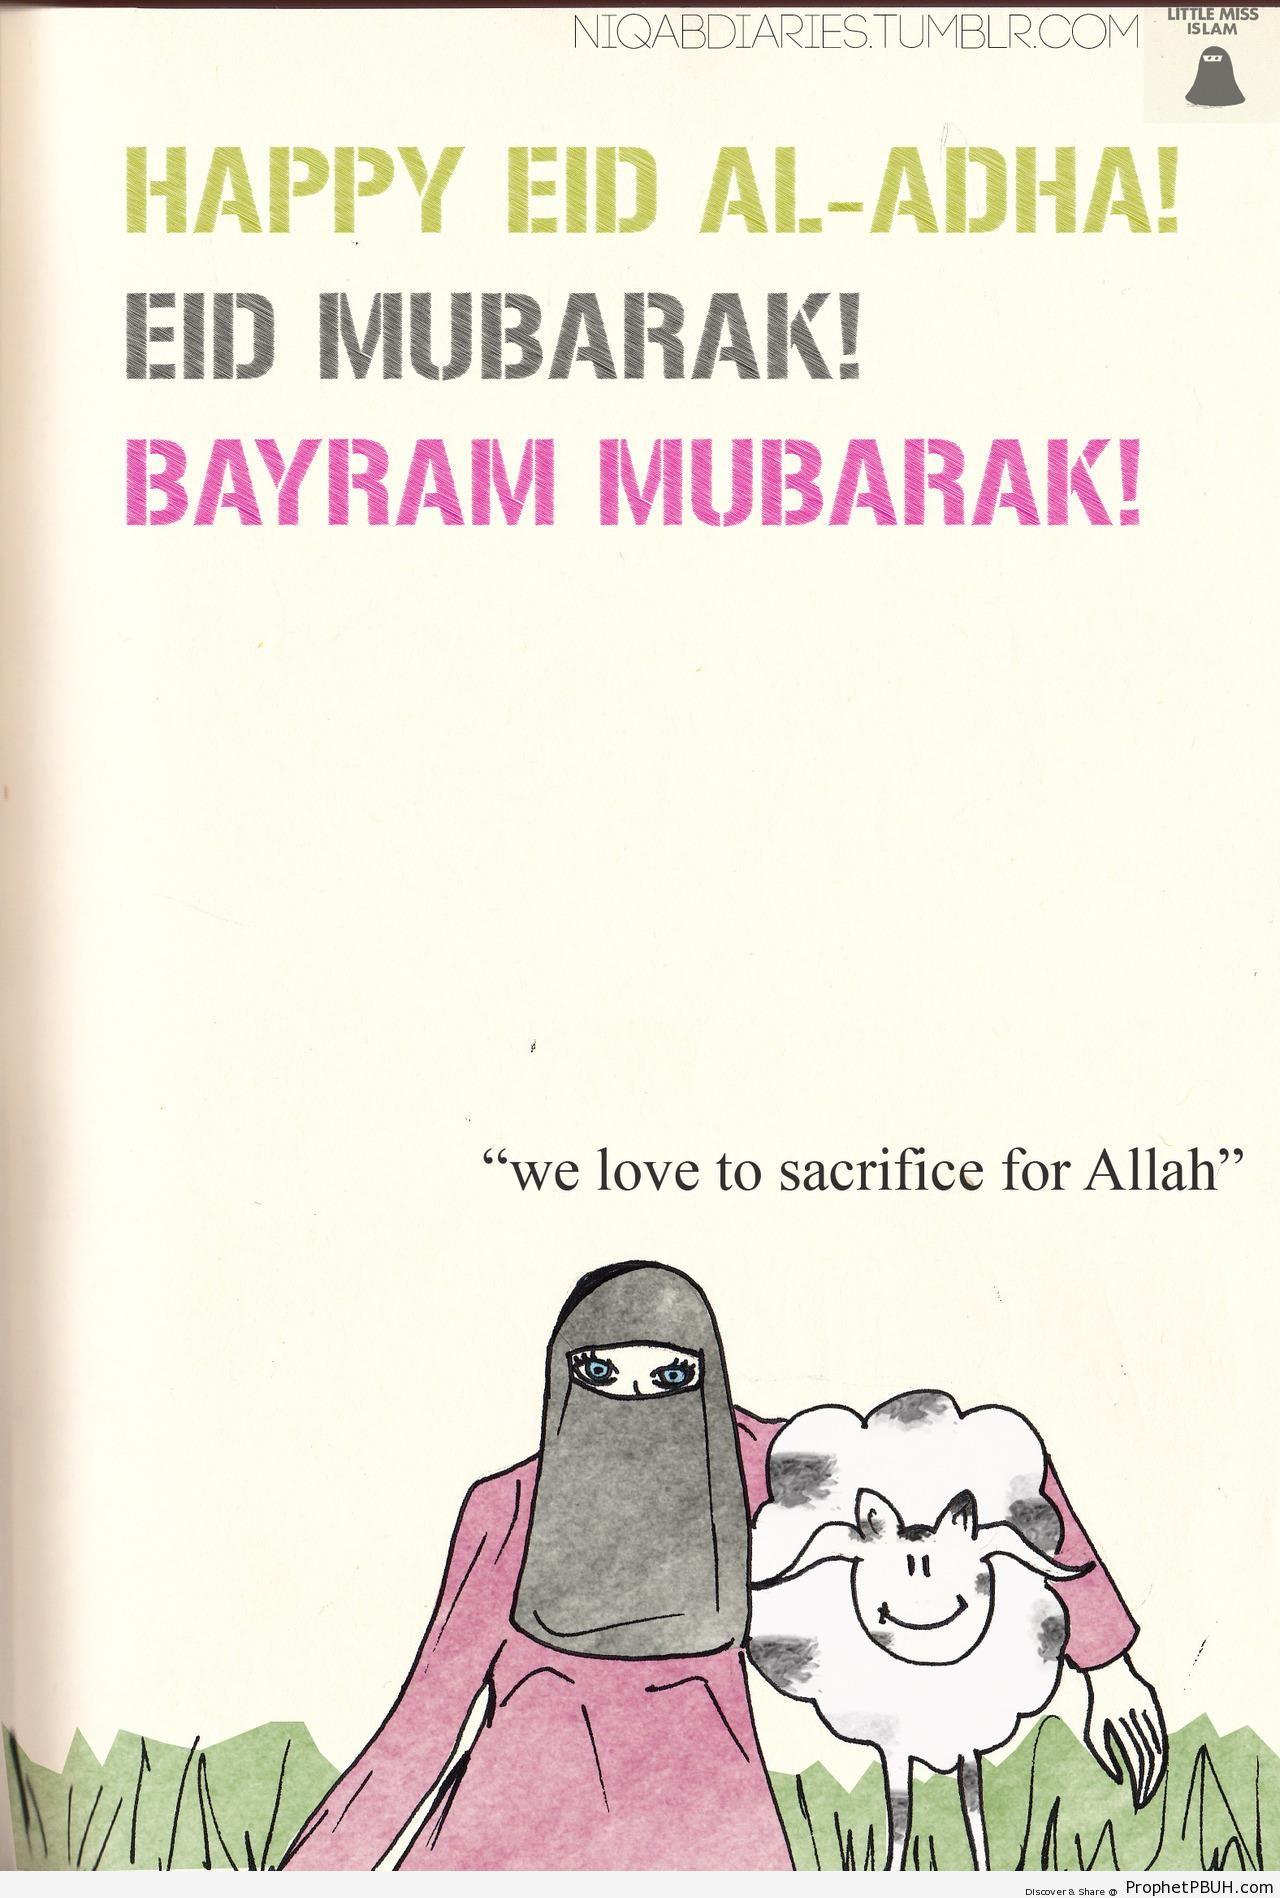 Eid al-Adha Greeting With Niqabi Woman Drawing - Drawings